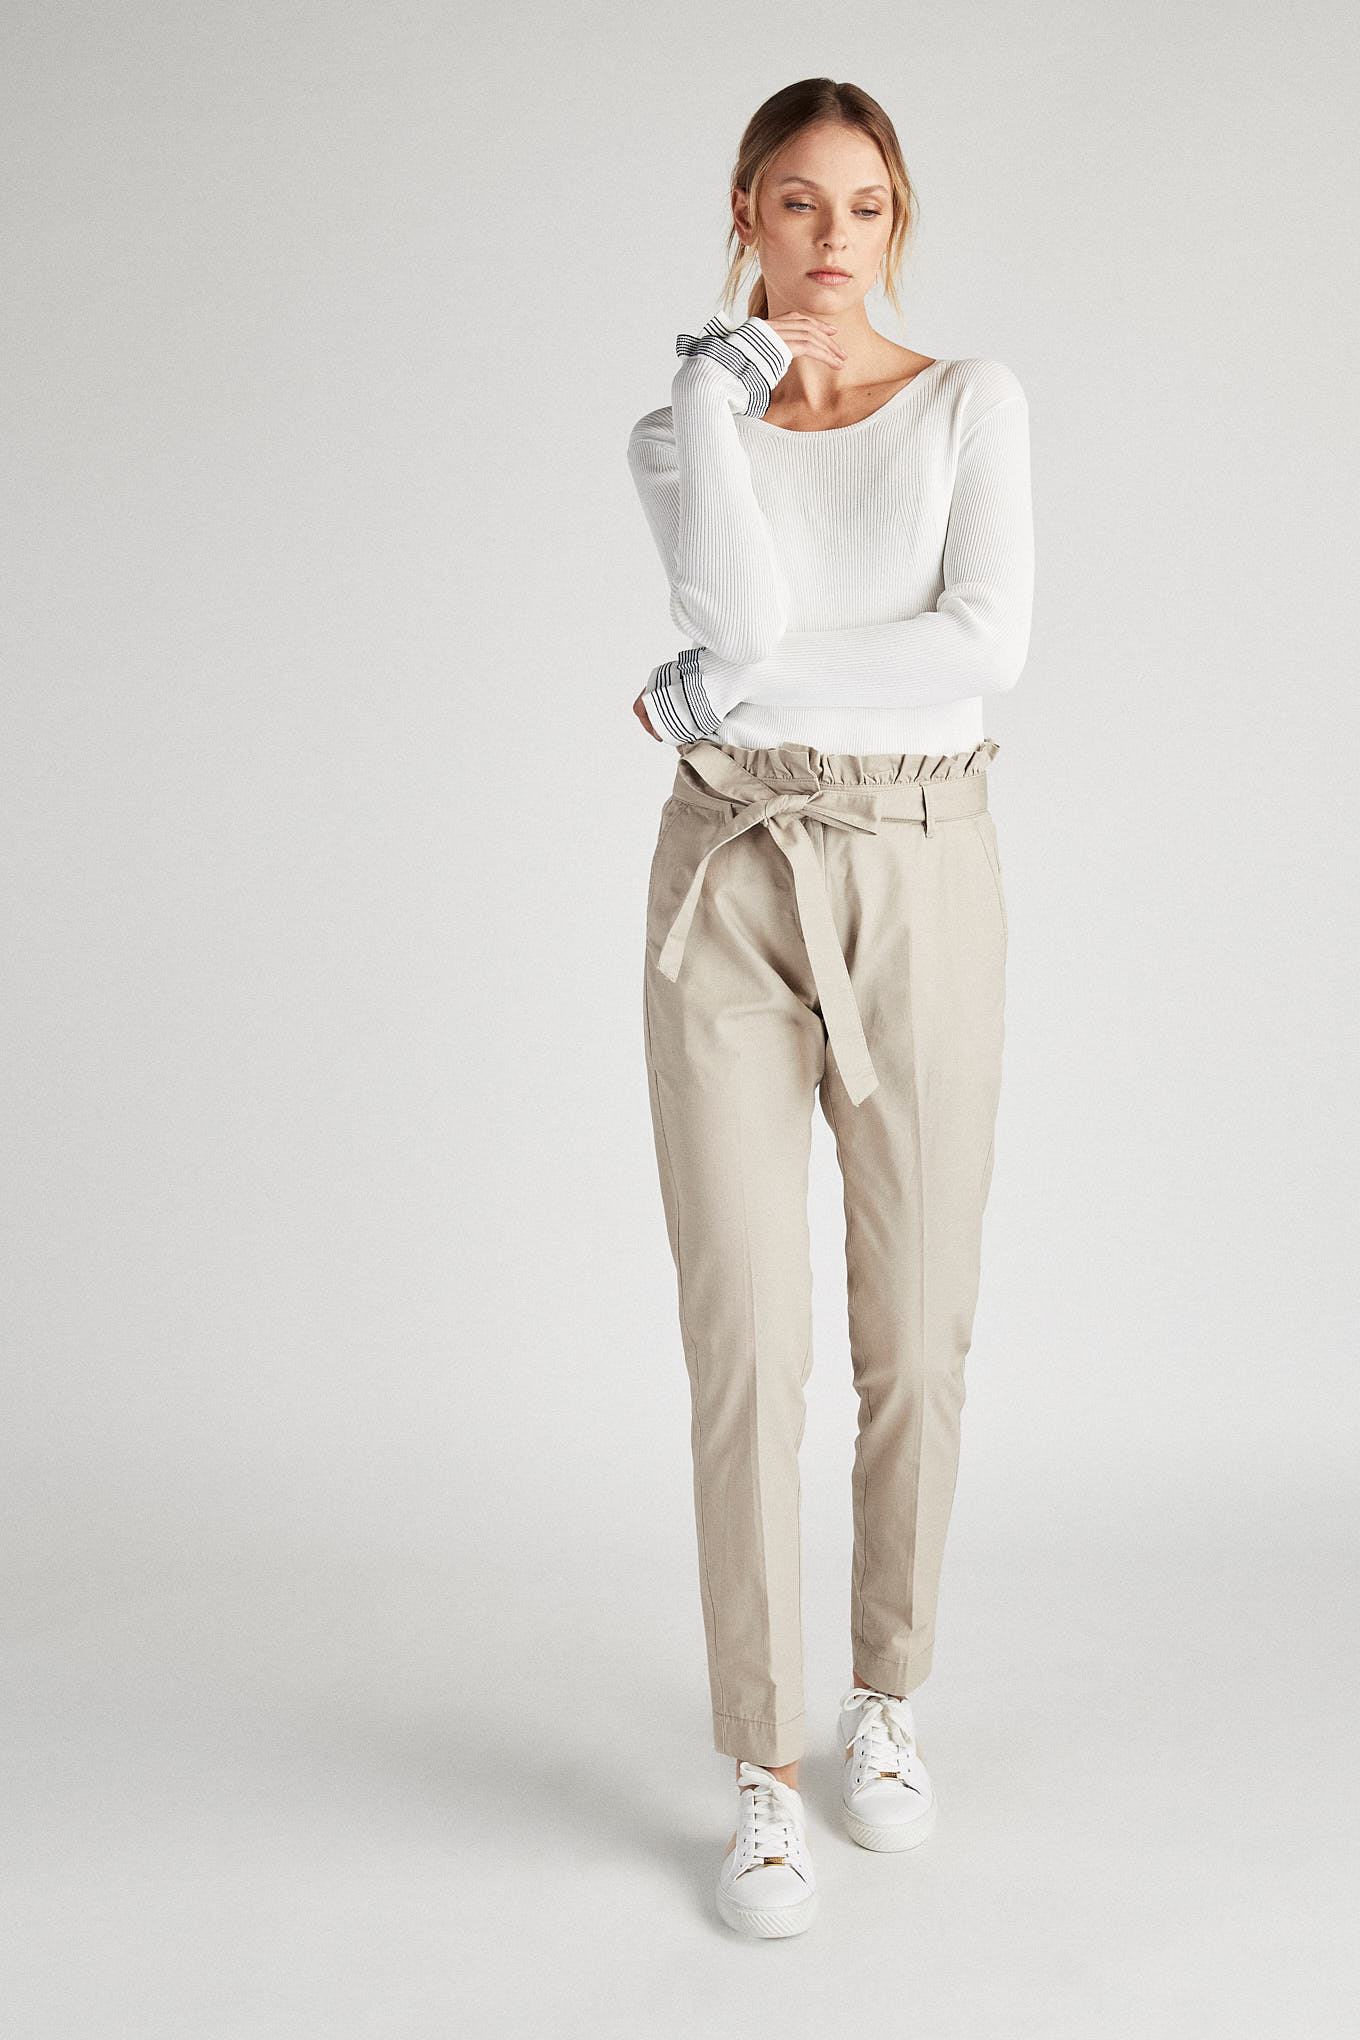 Malha Branco Casual Mulher